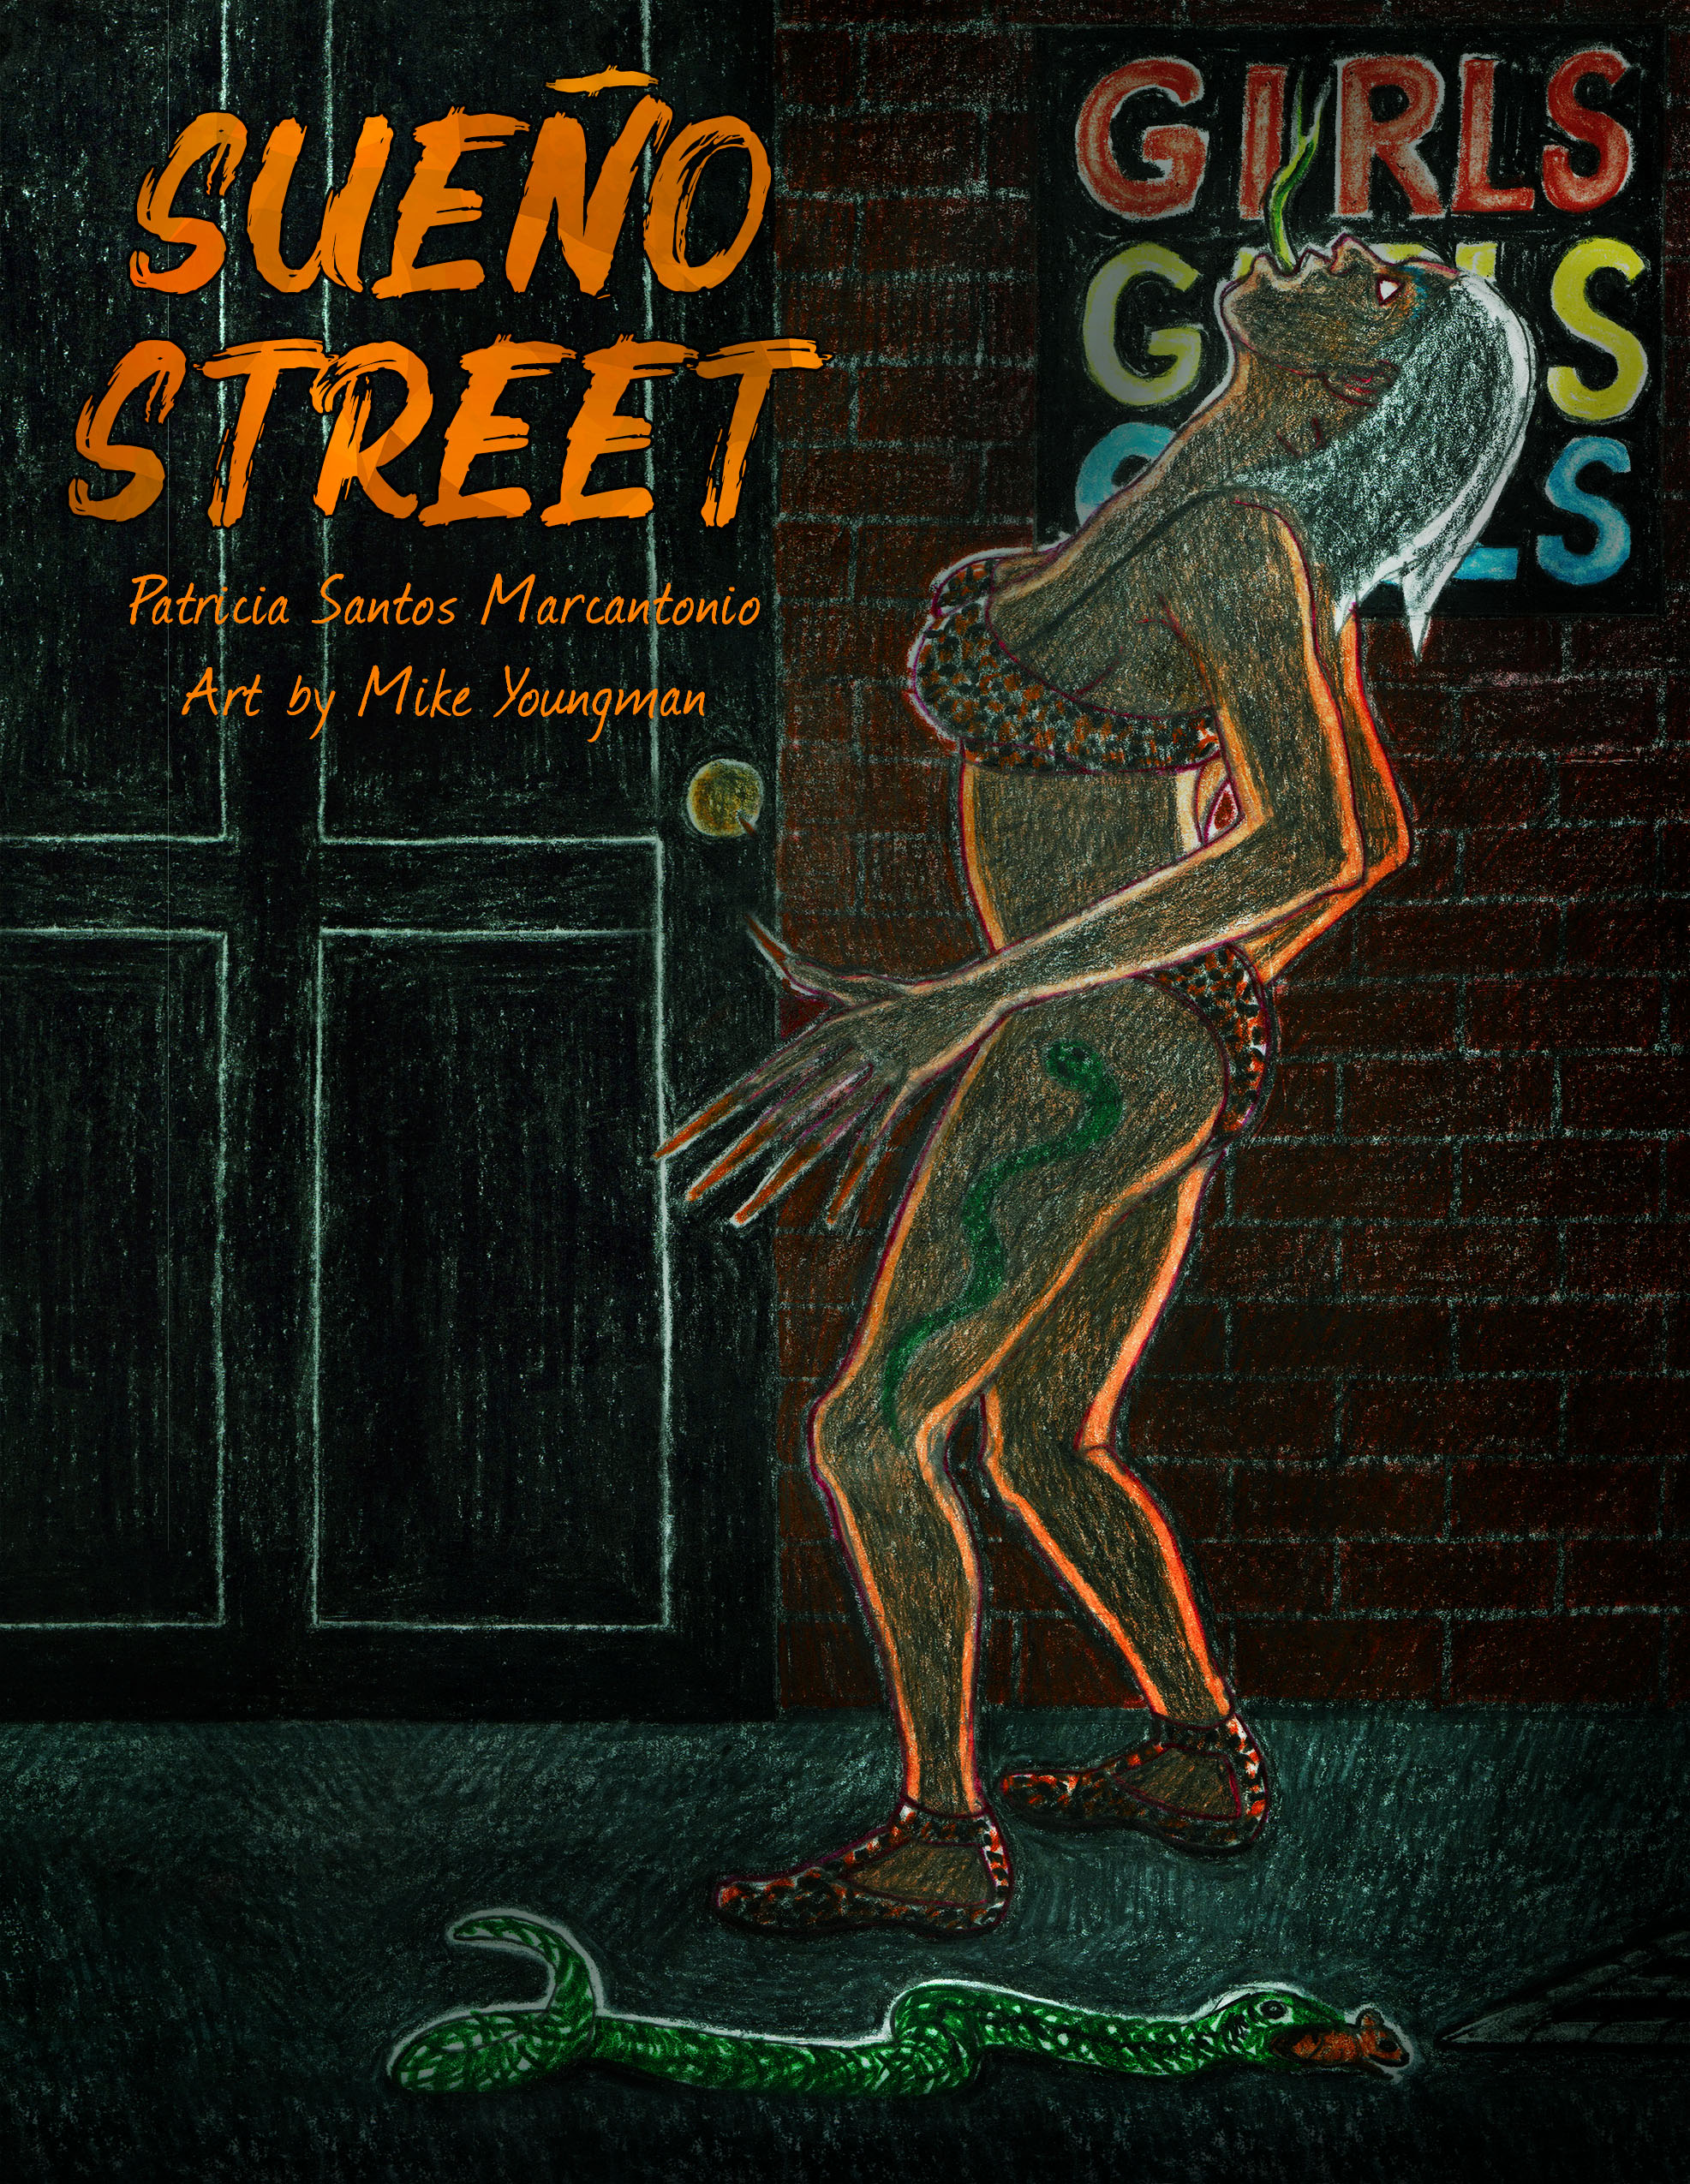 2017-1390 Patricia Santos Sueno Street